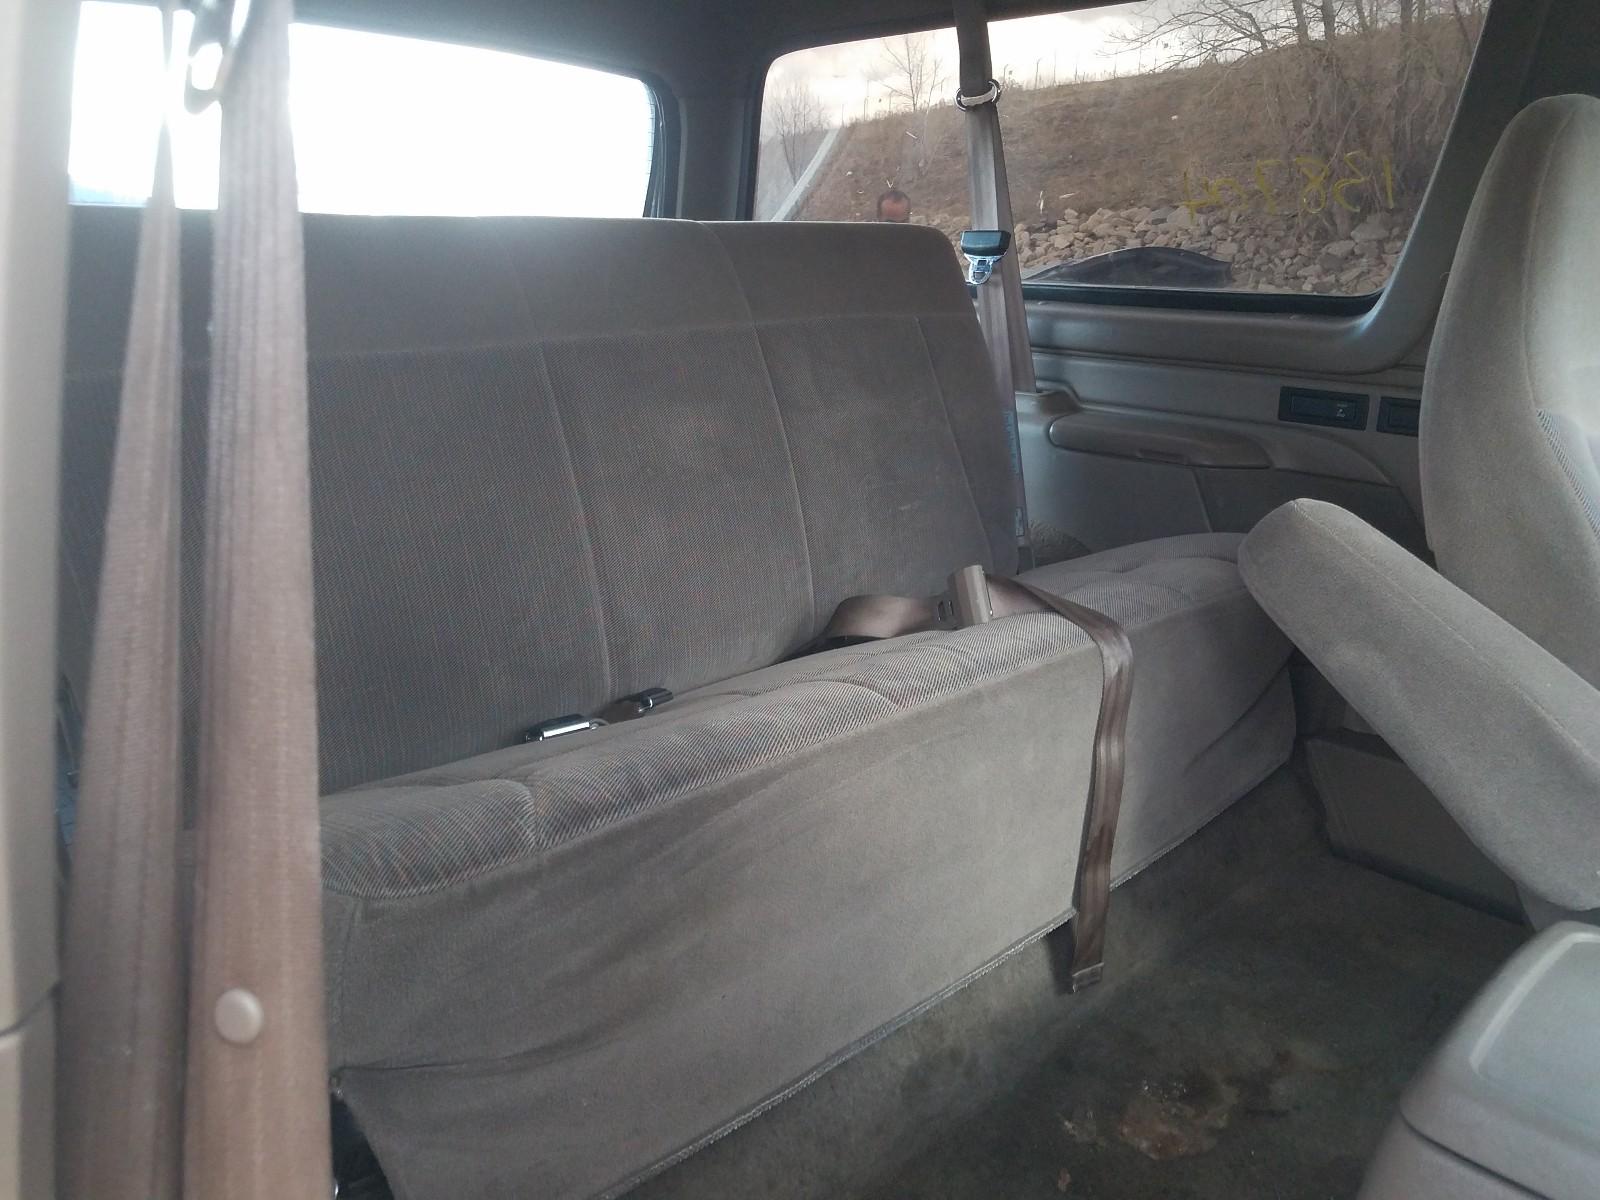 1FMEU15H6TLB33648 - 1996 Ford Bronco U10 5.8L detail view